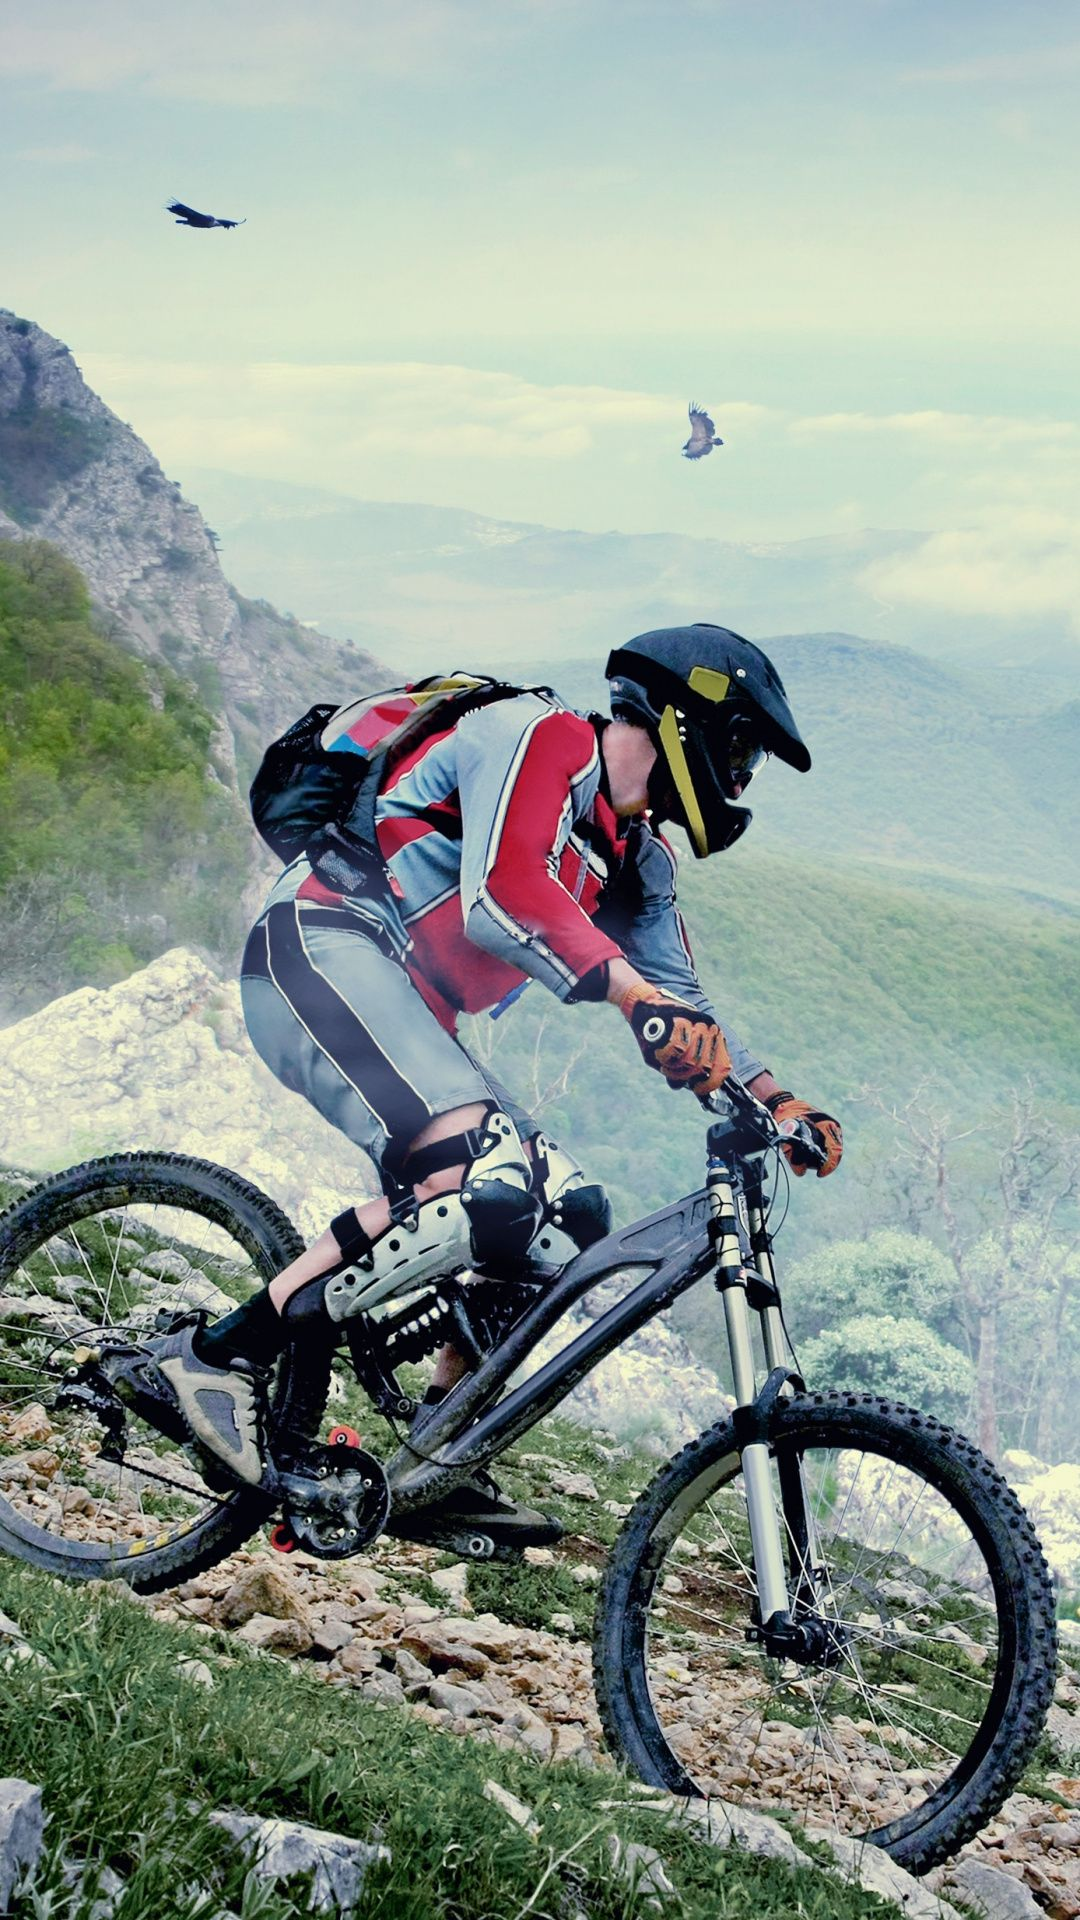 Wallpapers Road Cycling Cycling Freeride Bicycle Mountain Biking Mountain Biking Bicycle Bicycle Mountain Bike